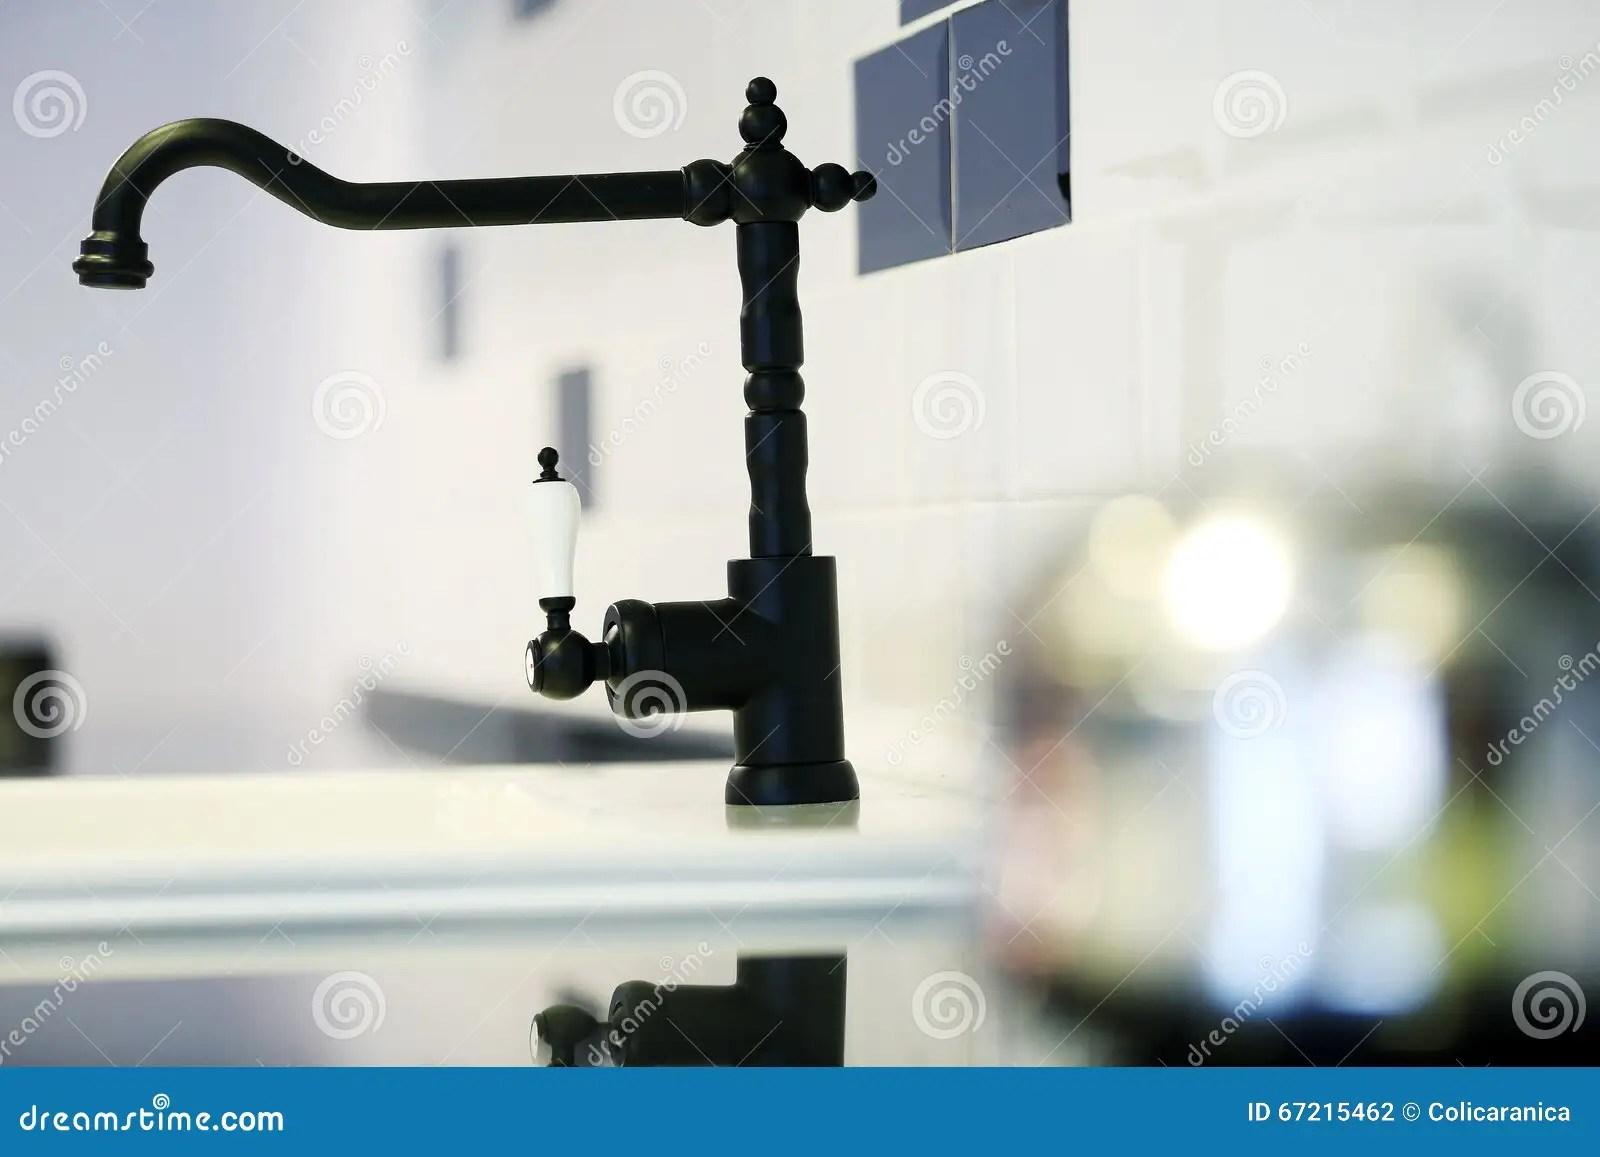 black faucet kitchen ready made island for 黑色龙头库存照片 图片包括有家具 厨房 的treadled 投反对票 龙头 黑现代龙头在厨房里 特写镜头视图